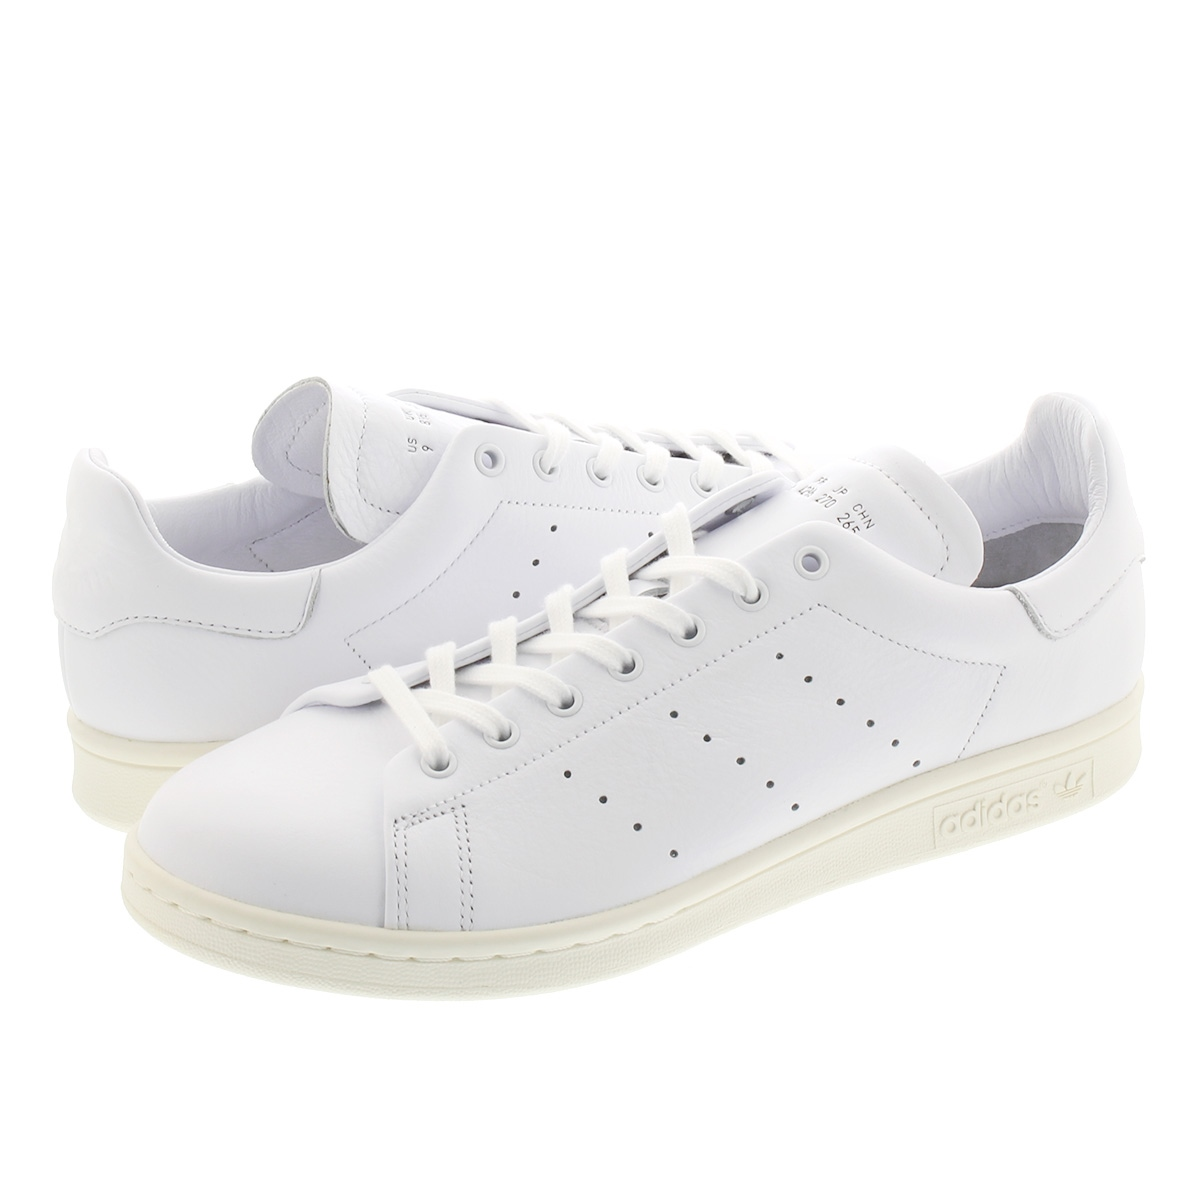 adidas STAN SMITH RECON アディダス スタンスミス リーコン RUNNING WHITE/RUNNING WHITE/OFF WHITE ee5790